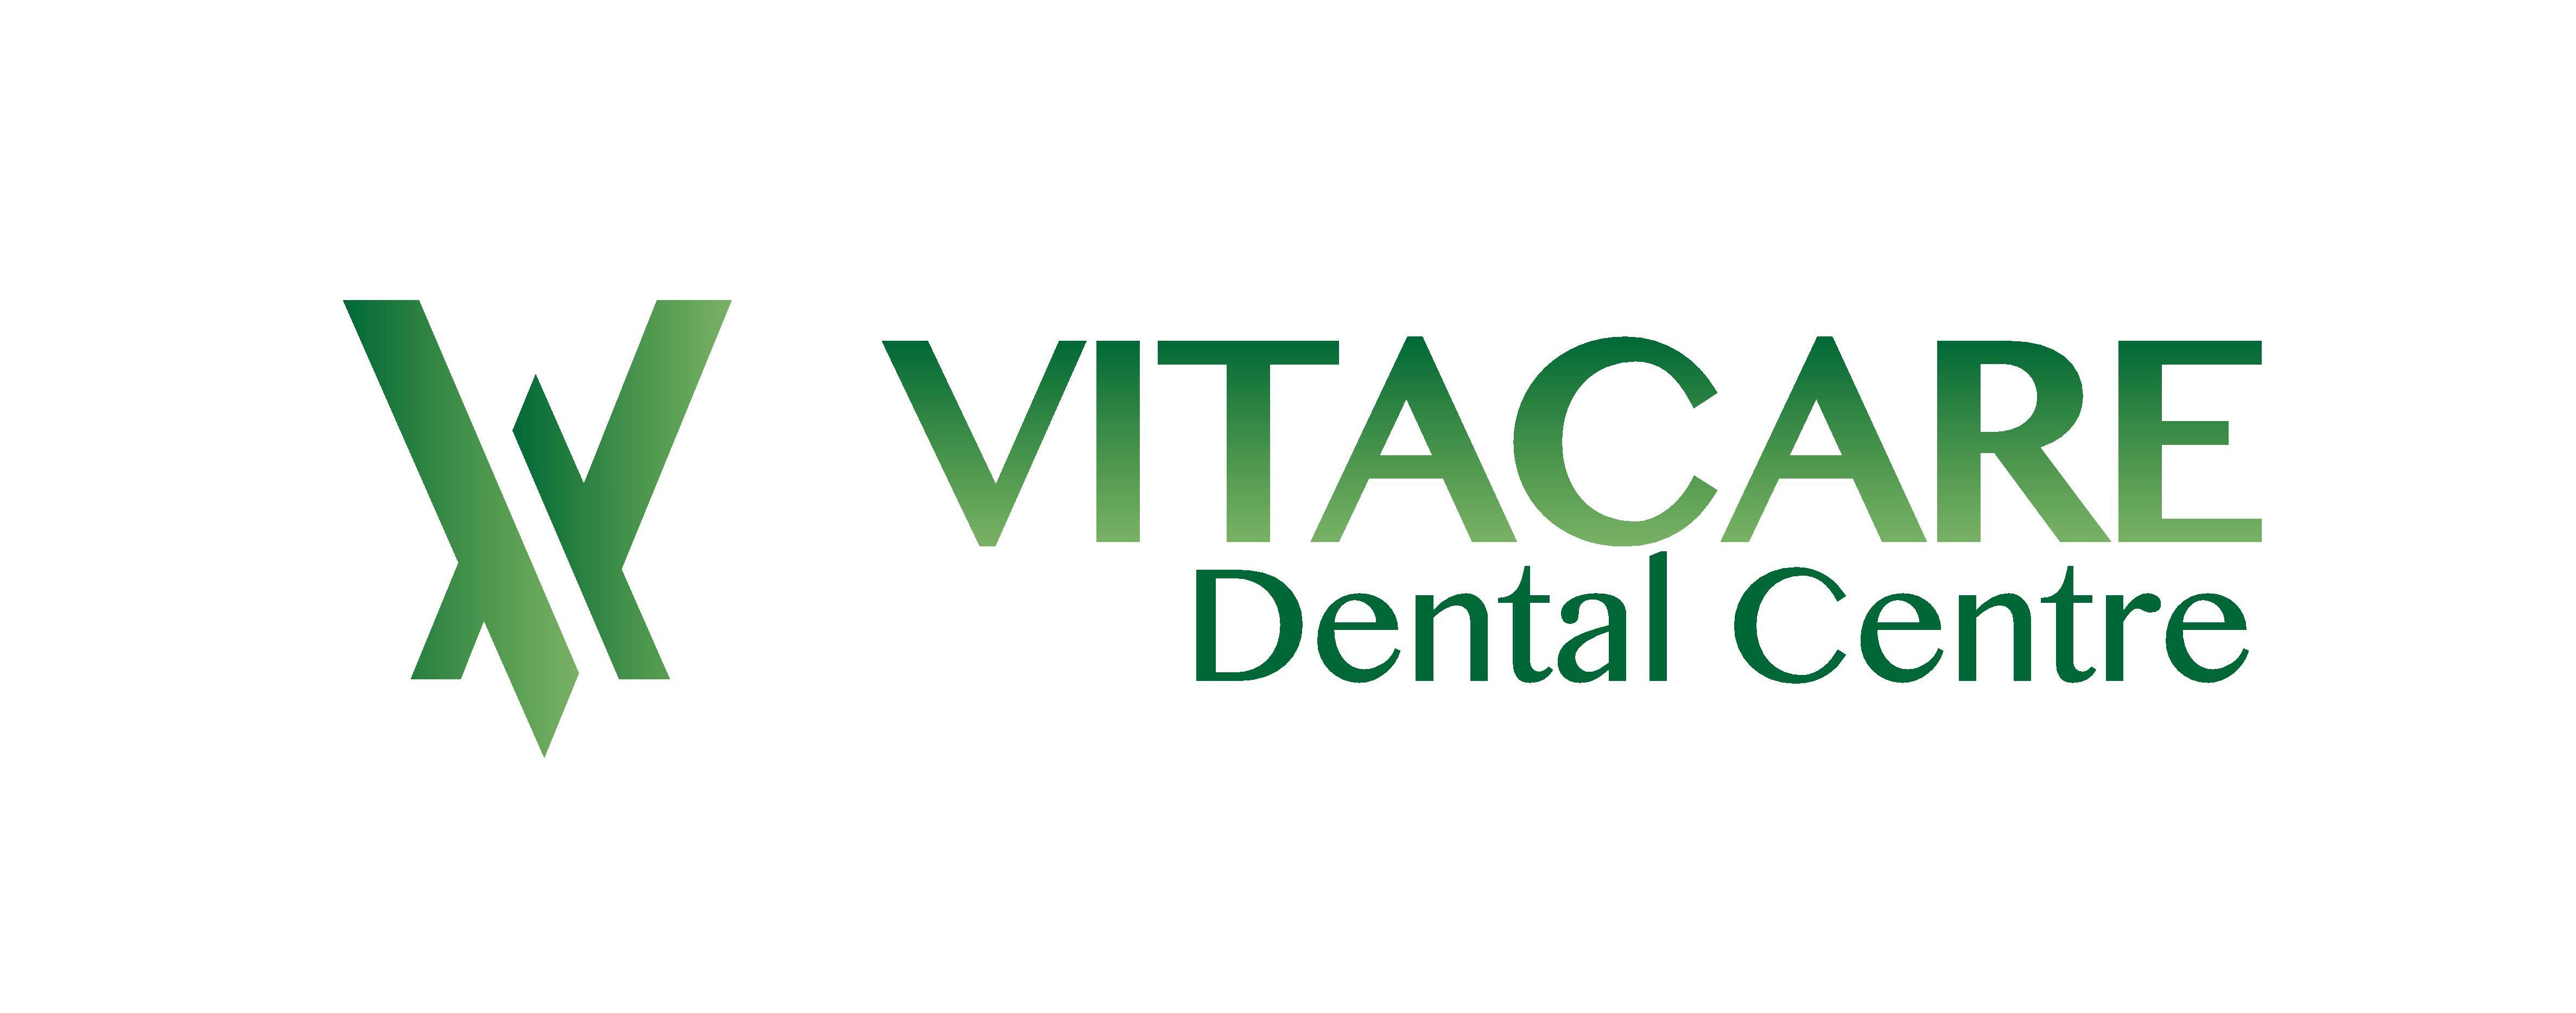 Vitacare Dental Centre reviews   Cosmetic Dentists at 101- 1655 Como Lake Ave - Coquitlam BC